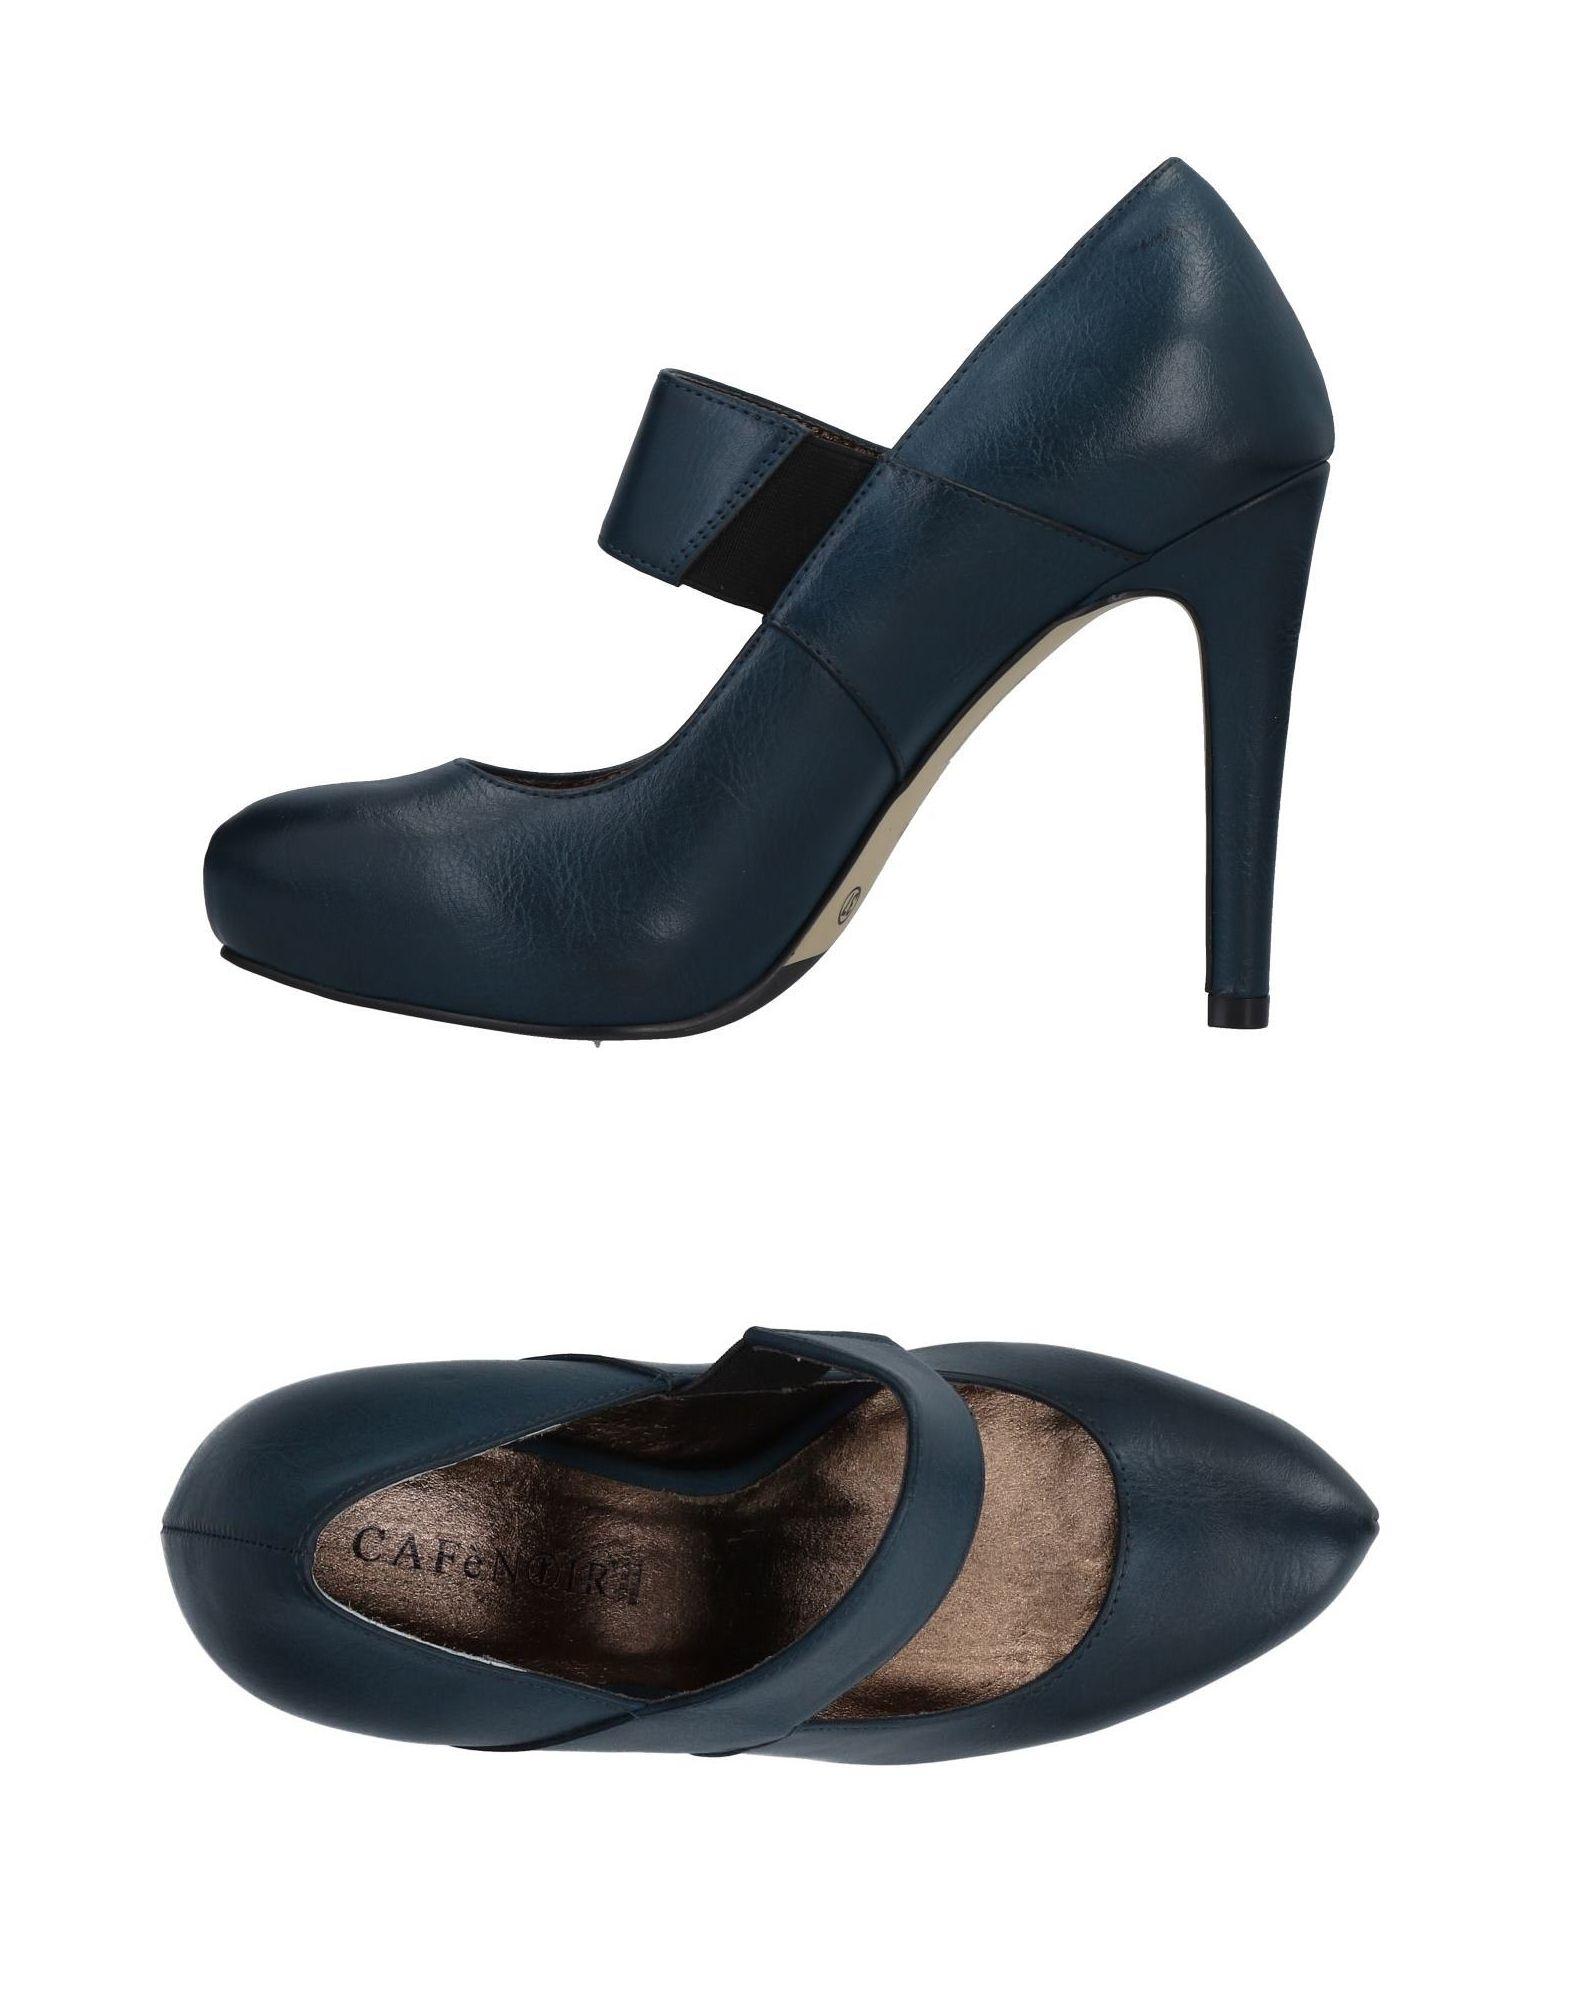 Günstige und modische Schuhe Cafènoir Pumps Damen  11477935LP